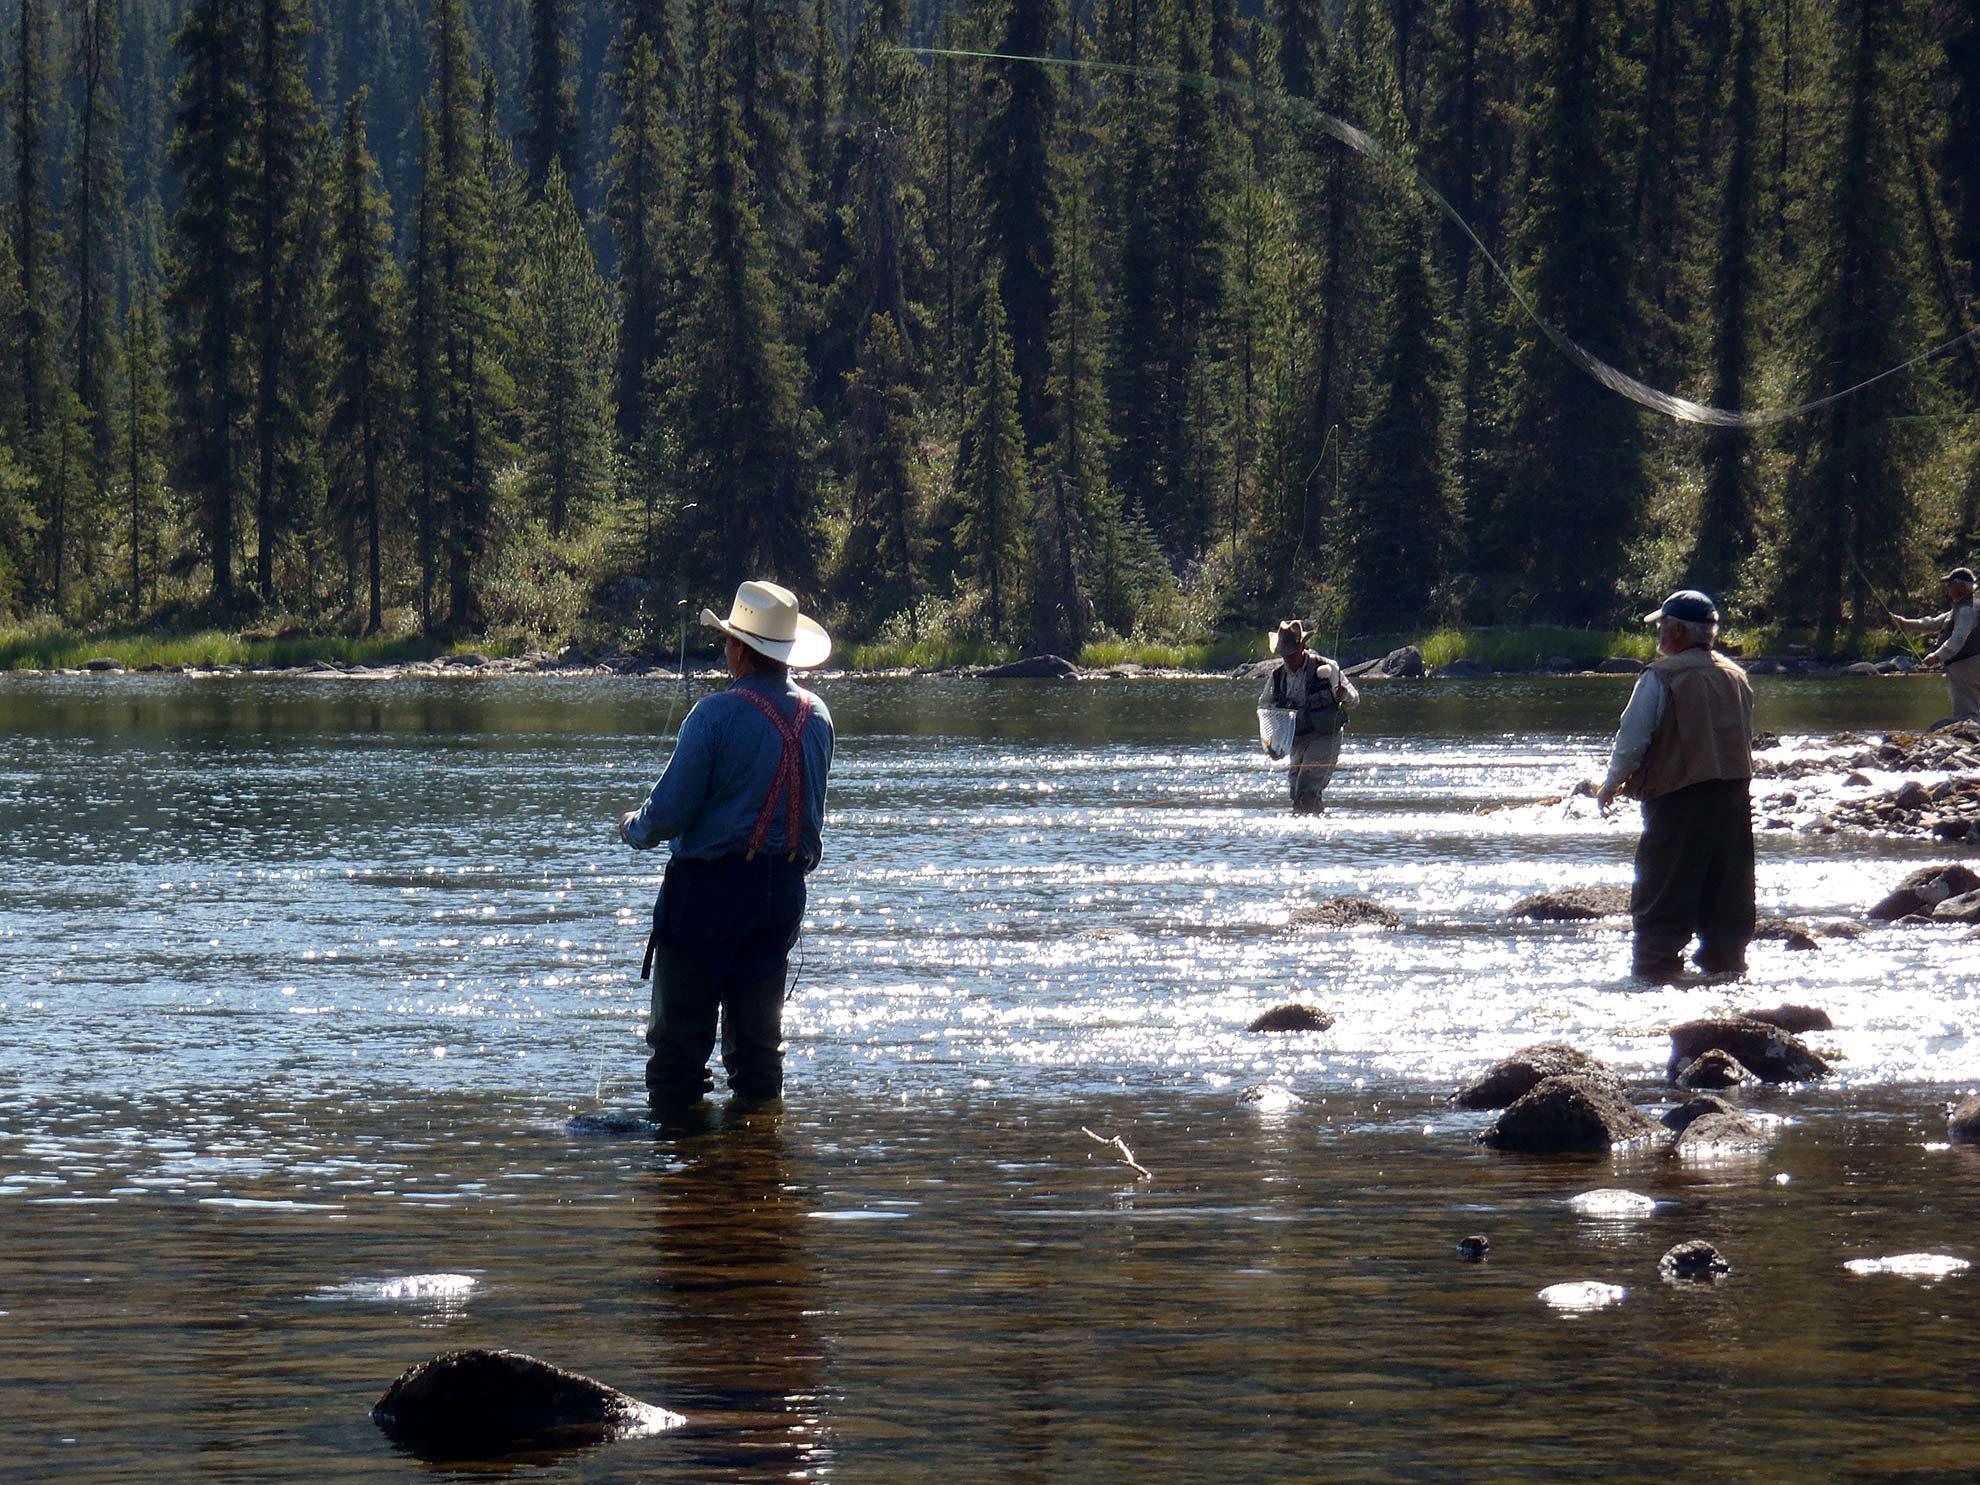 Fly Fishing in beautiful Northern British Columbia